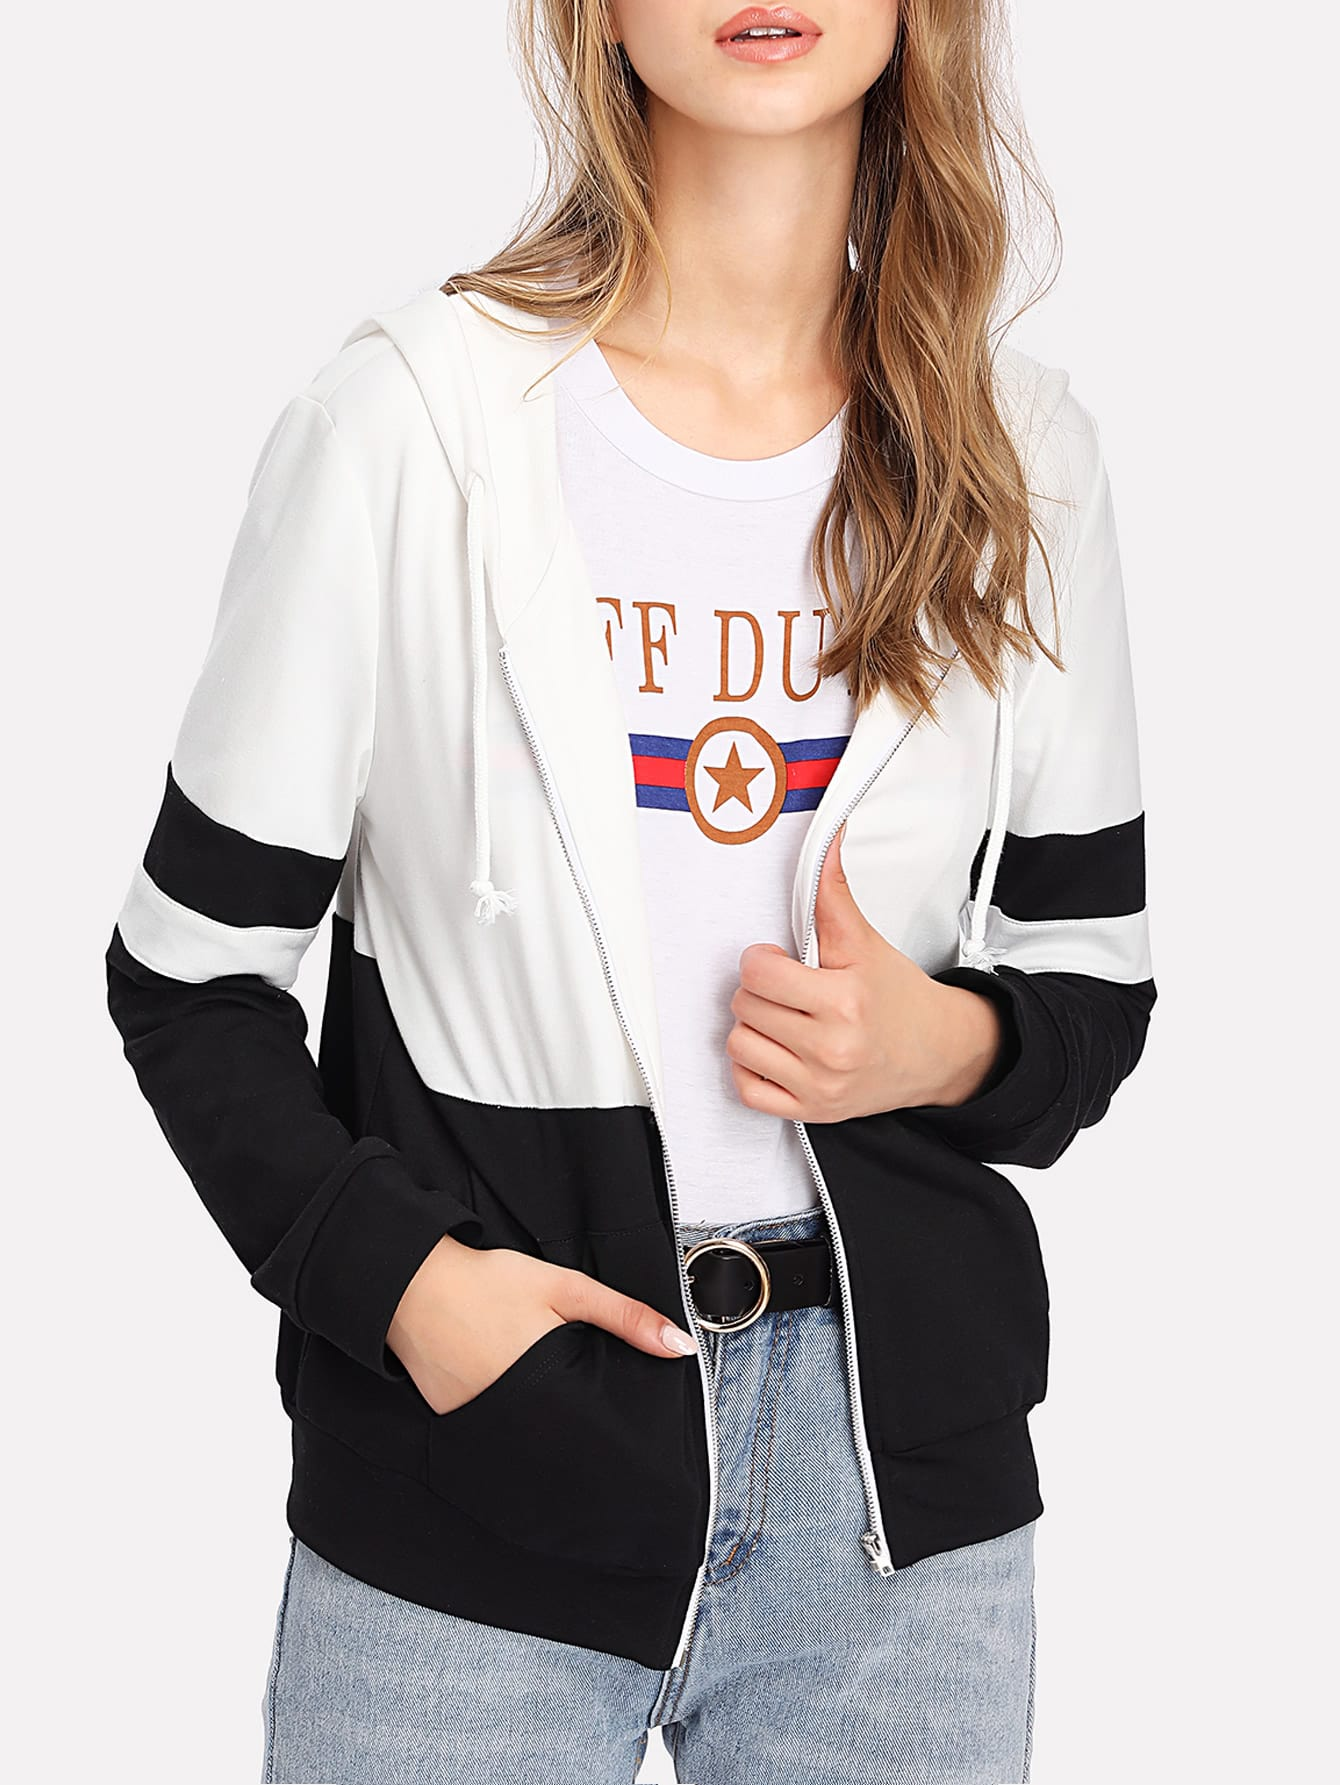 Two Tone Zip Up Hoodie Jacket zip up jacket